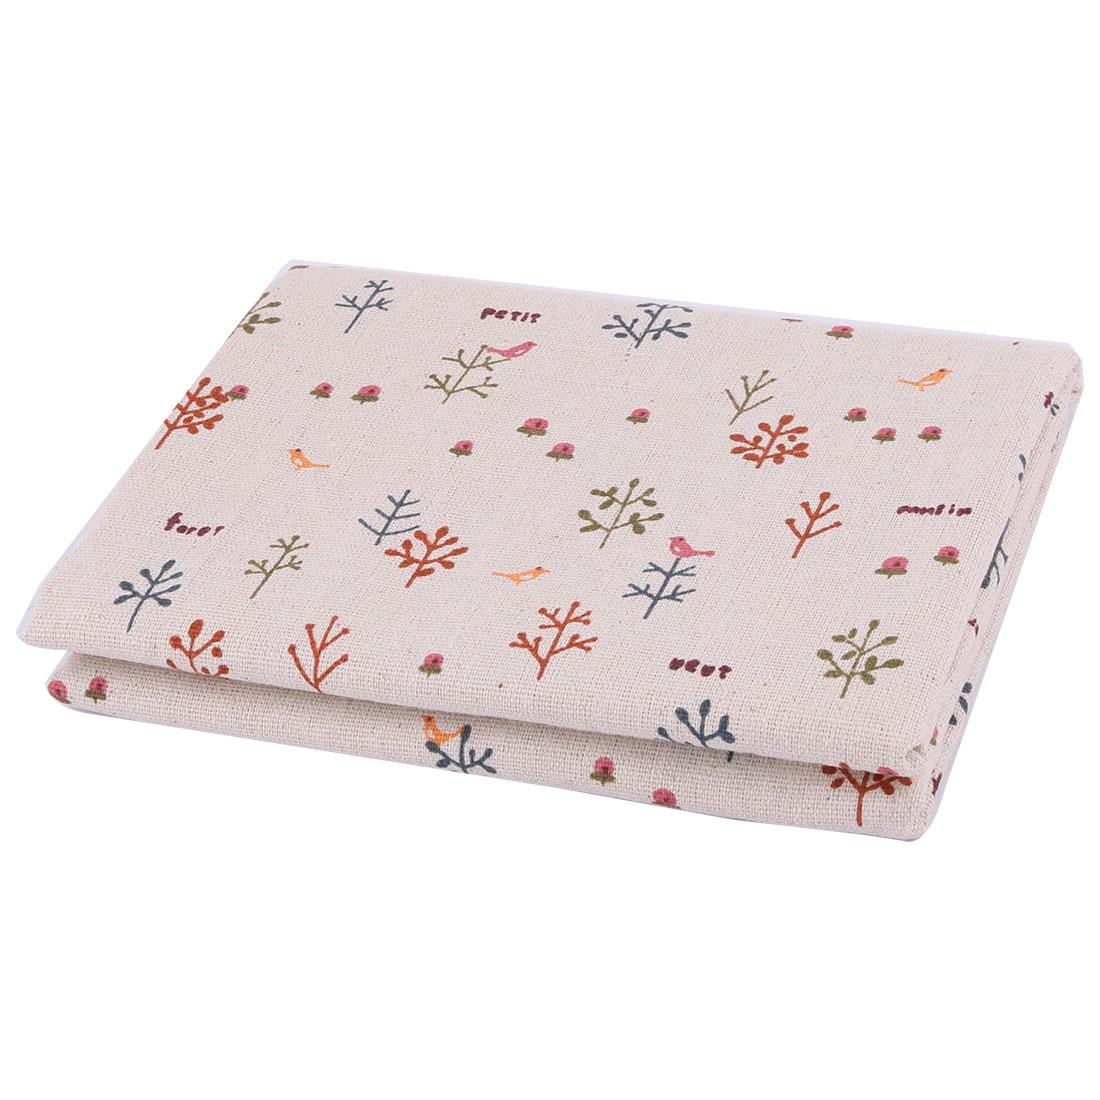 Unique BargainsHome Decor Linen Tree Pattern Tablecloth Book Sofa Cover DIY Fabric 1.55M Length